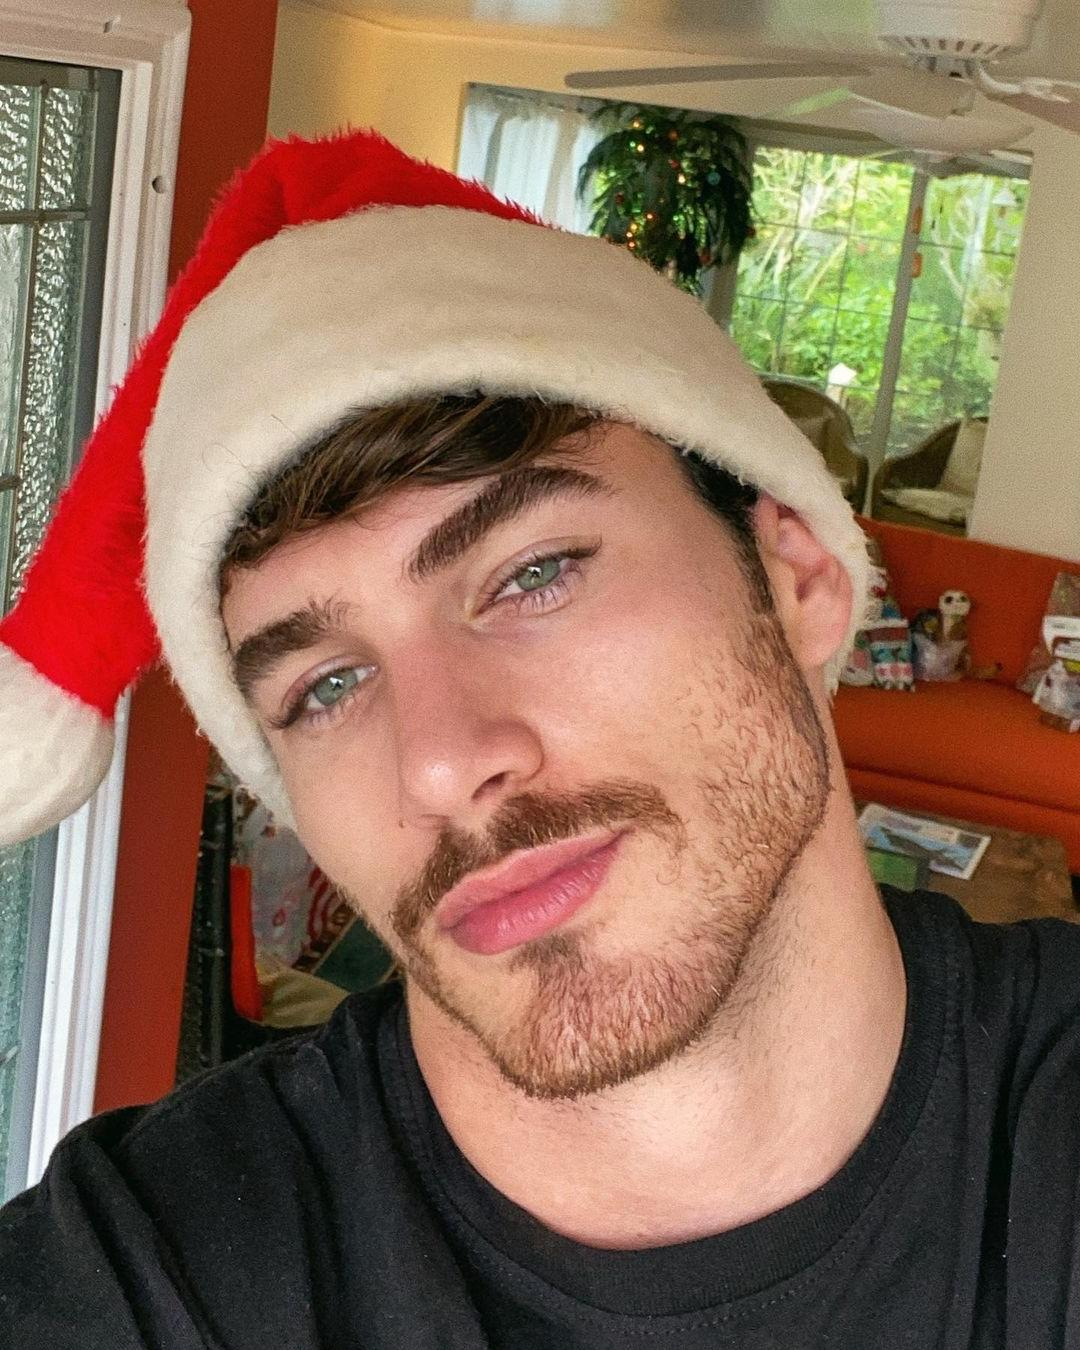 beautiful-gay-model-young-bottom-santa-claus-michael-yerger-christmas-hat